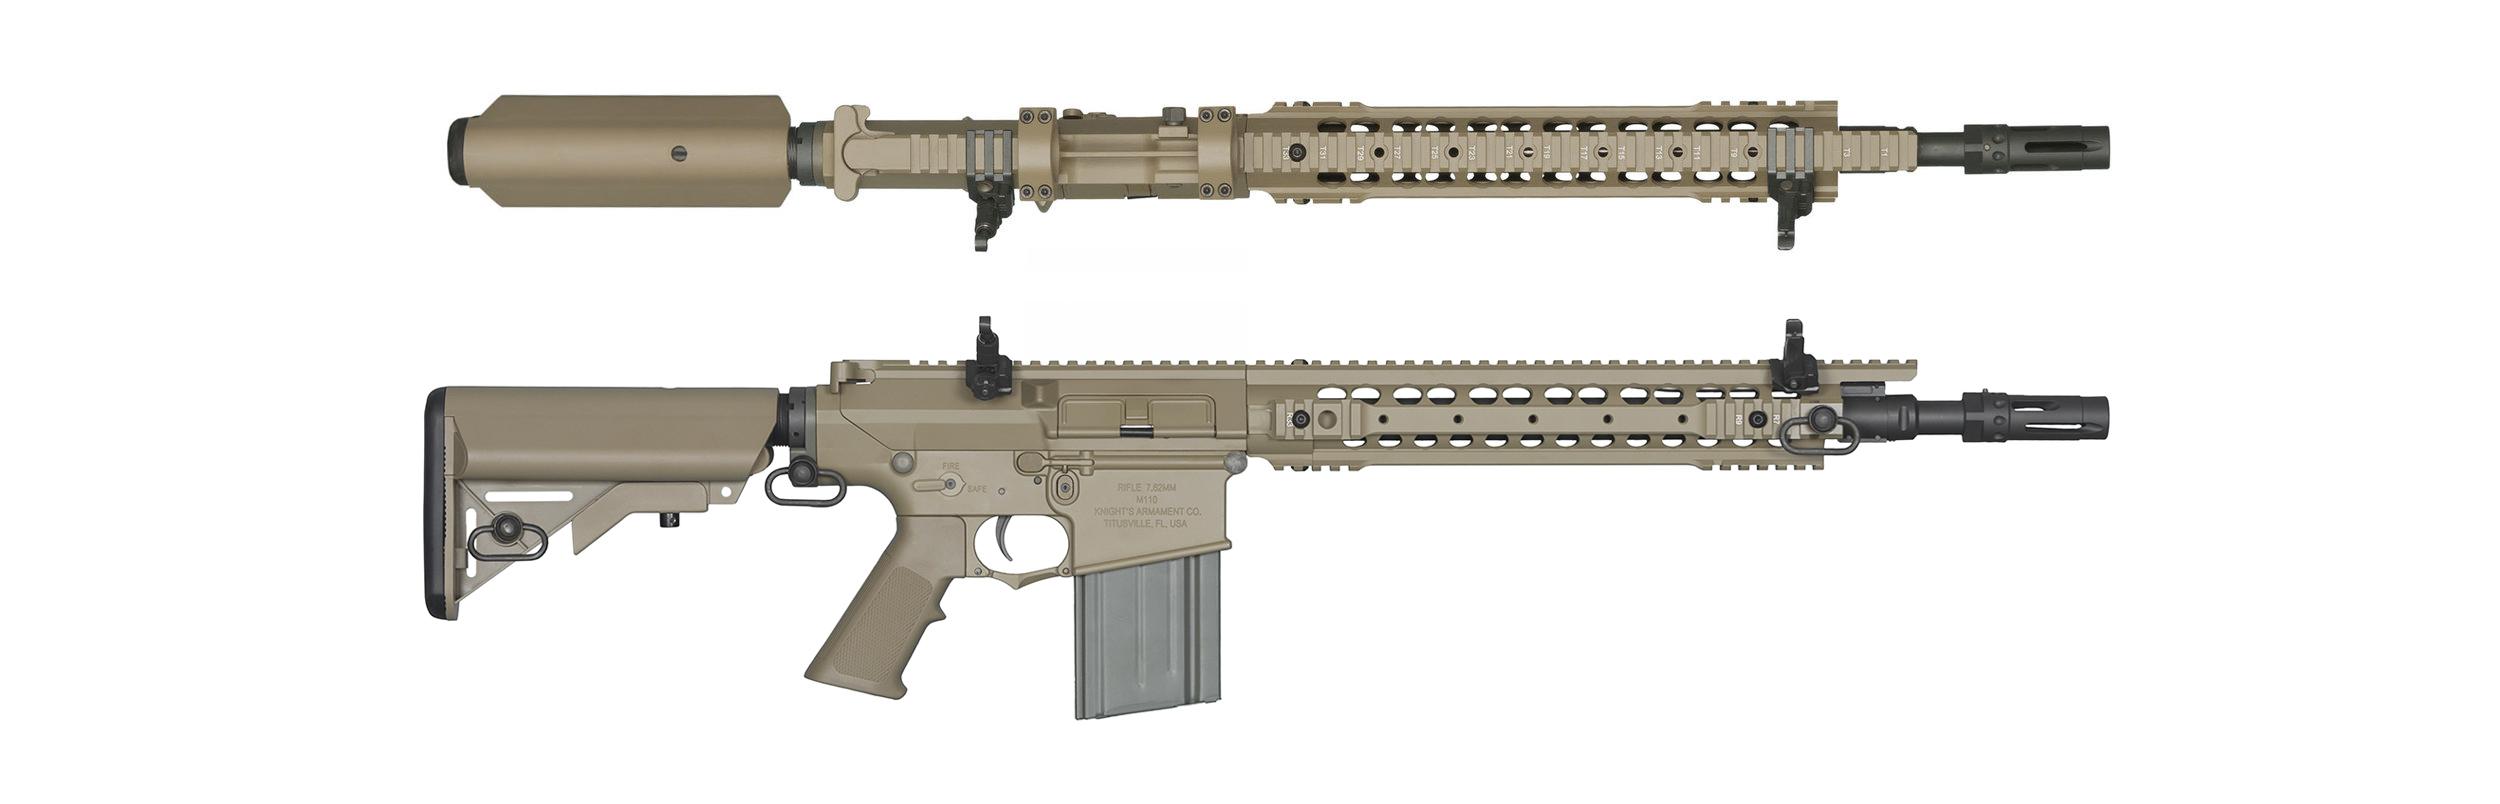 M110SASS.jpg